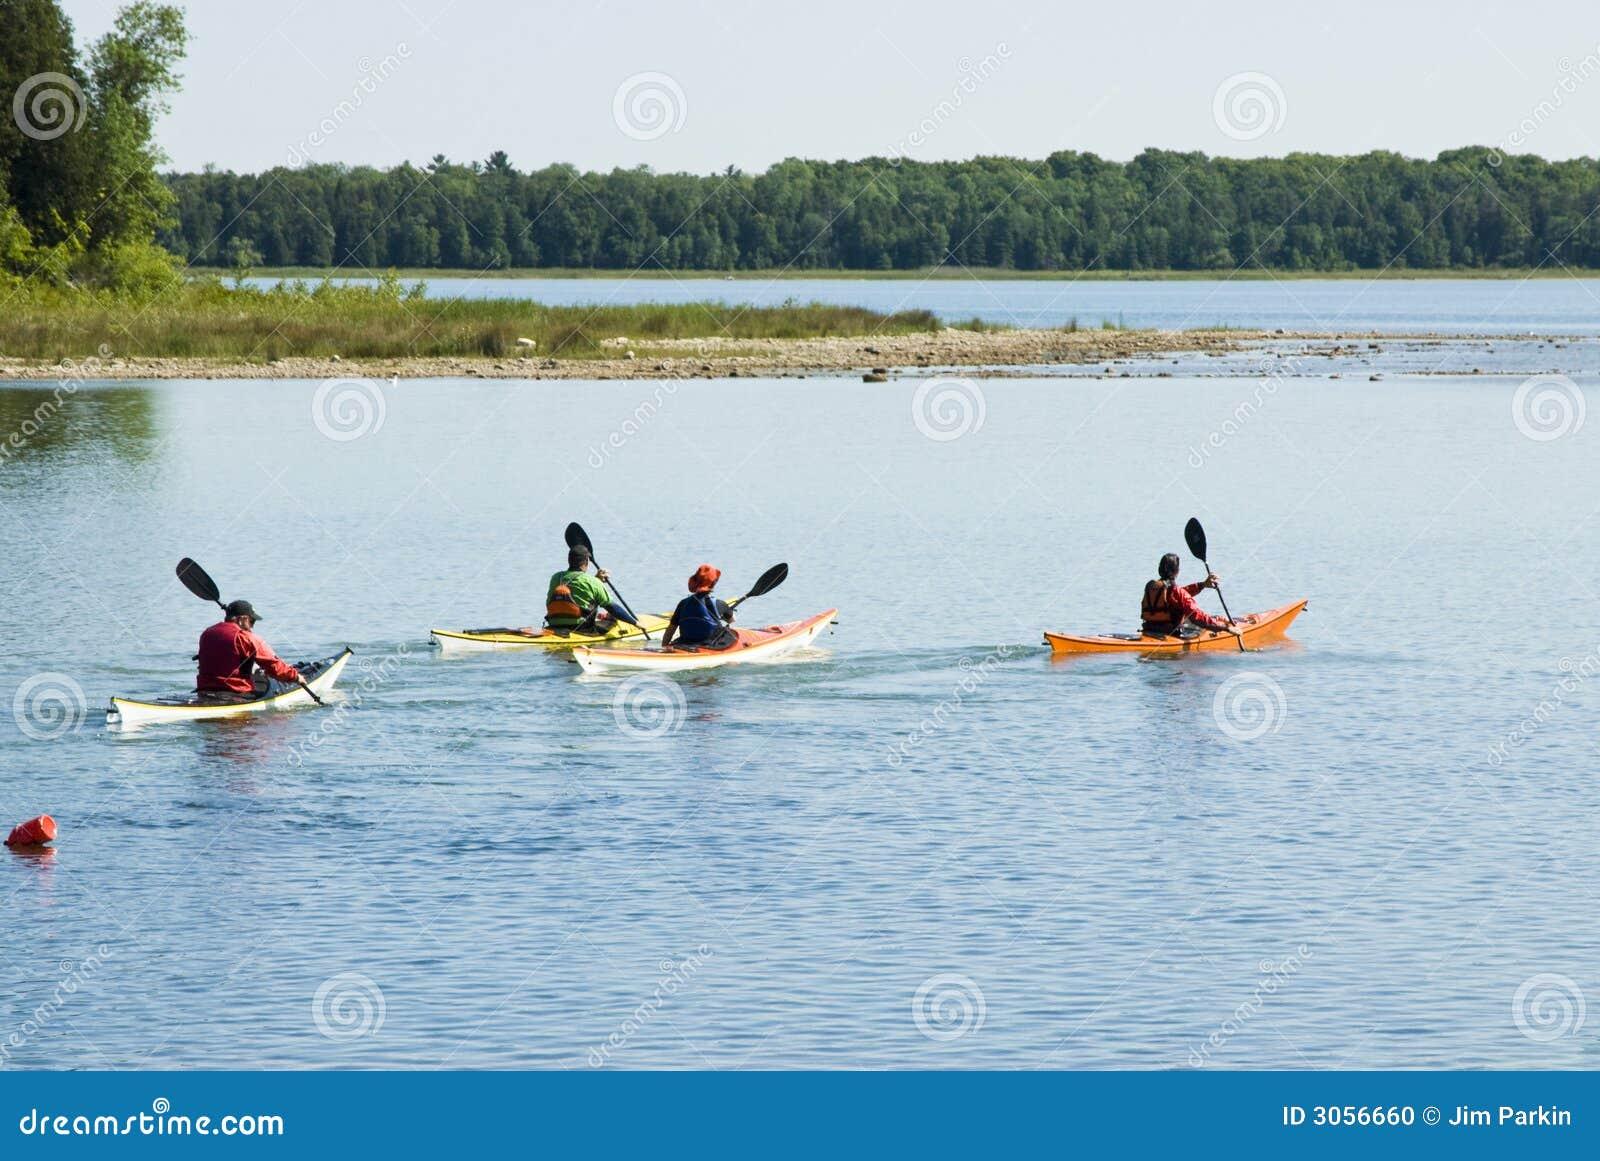 Kayaking 3 stock photo. Image of marine, pleasure, kayaks - 3056660